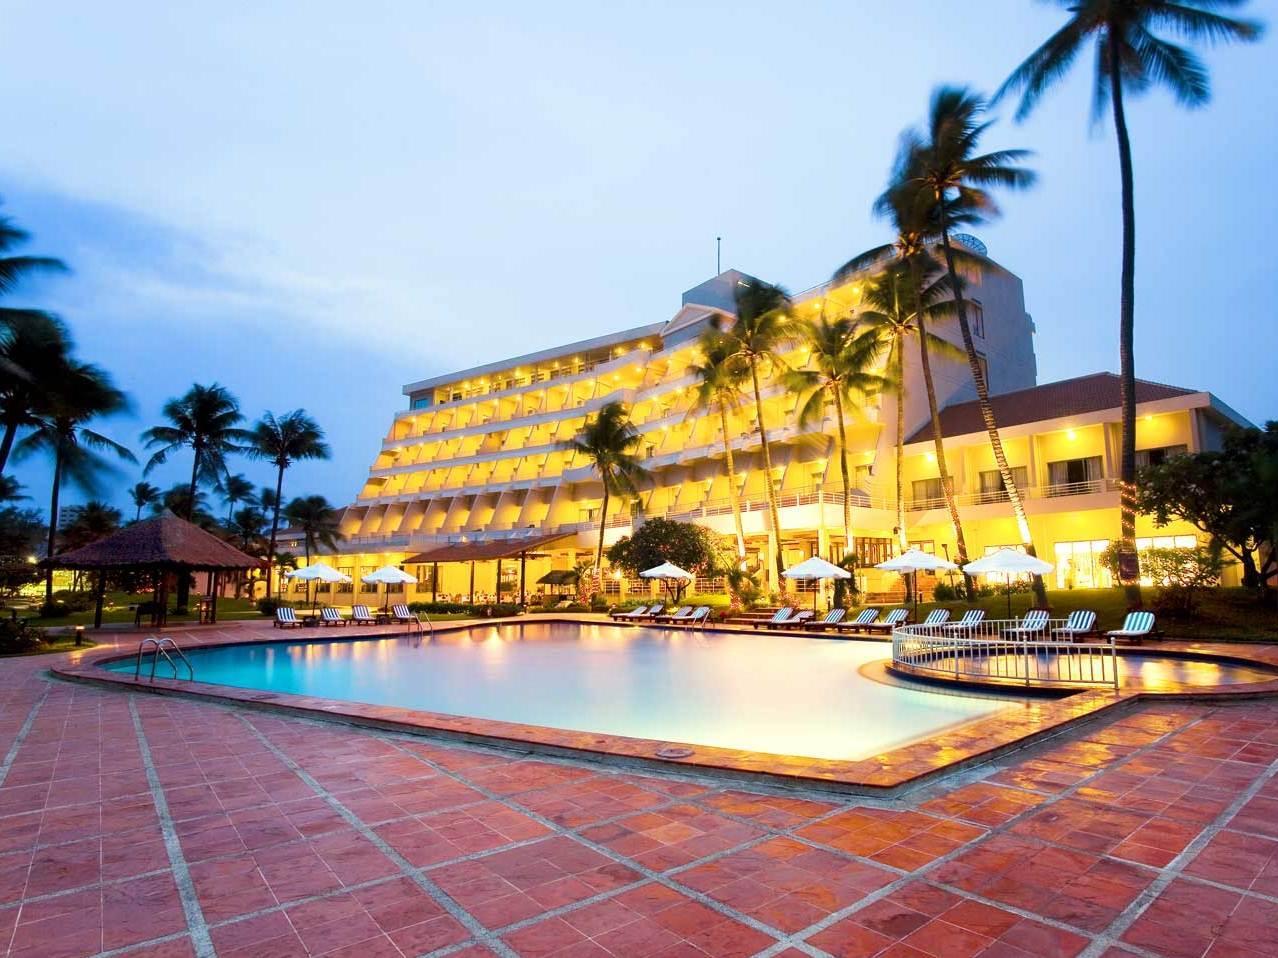 Phan Thiet Ocean Dunes Resort - Phan Thiet